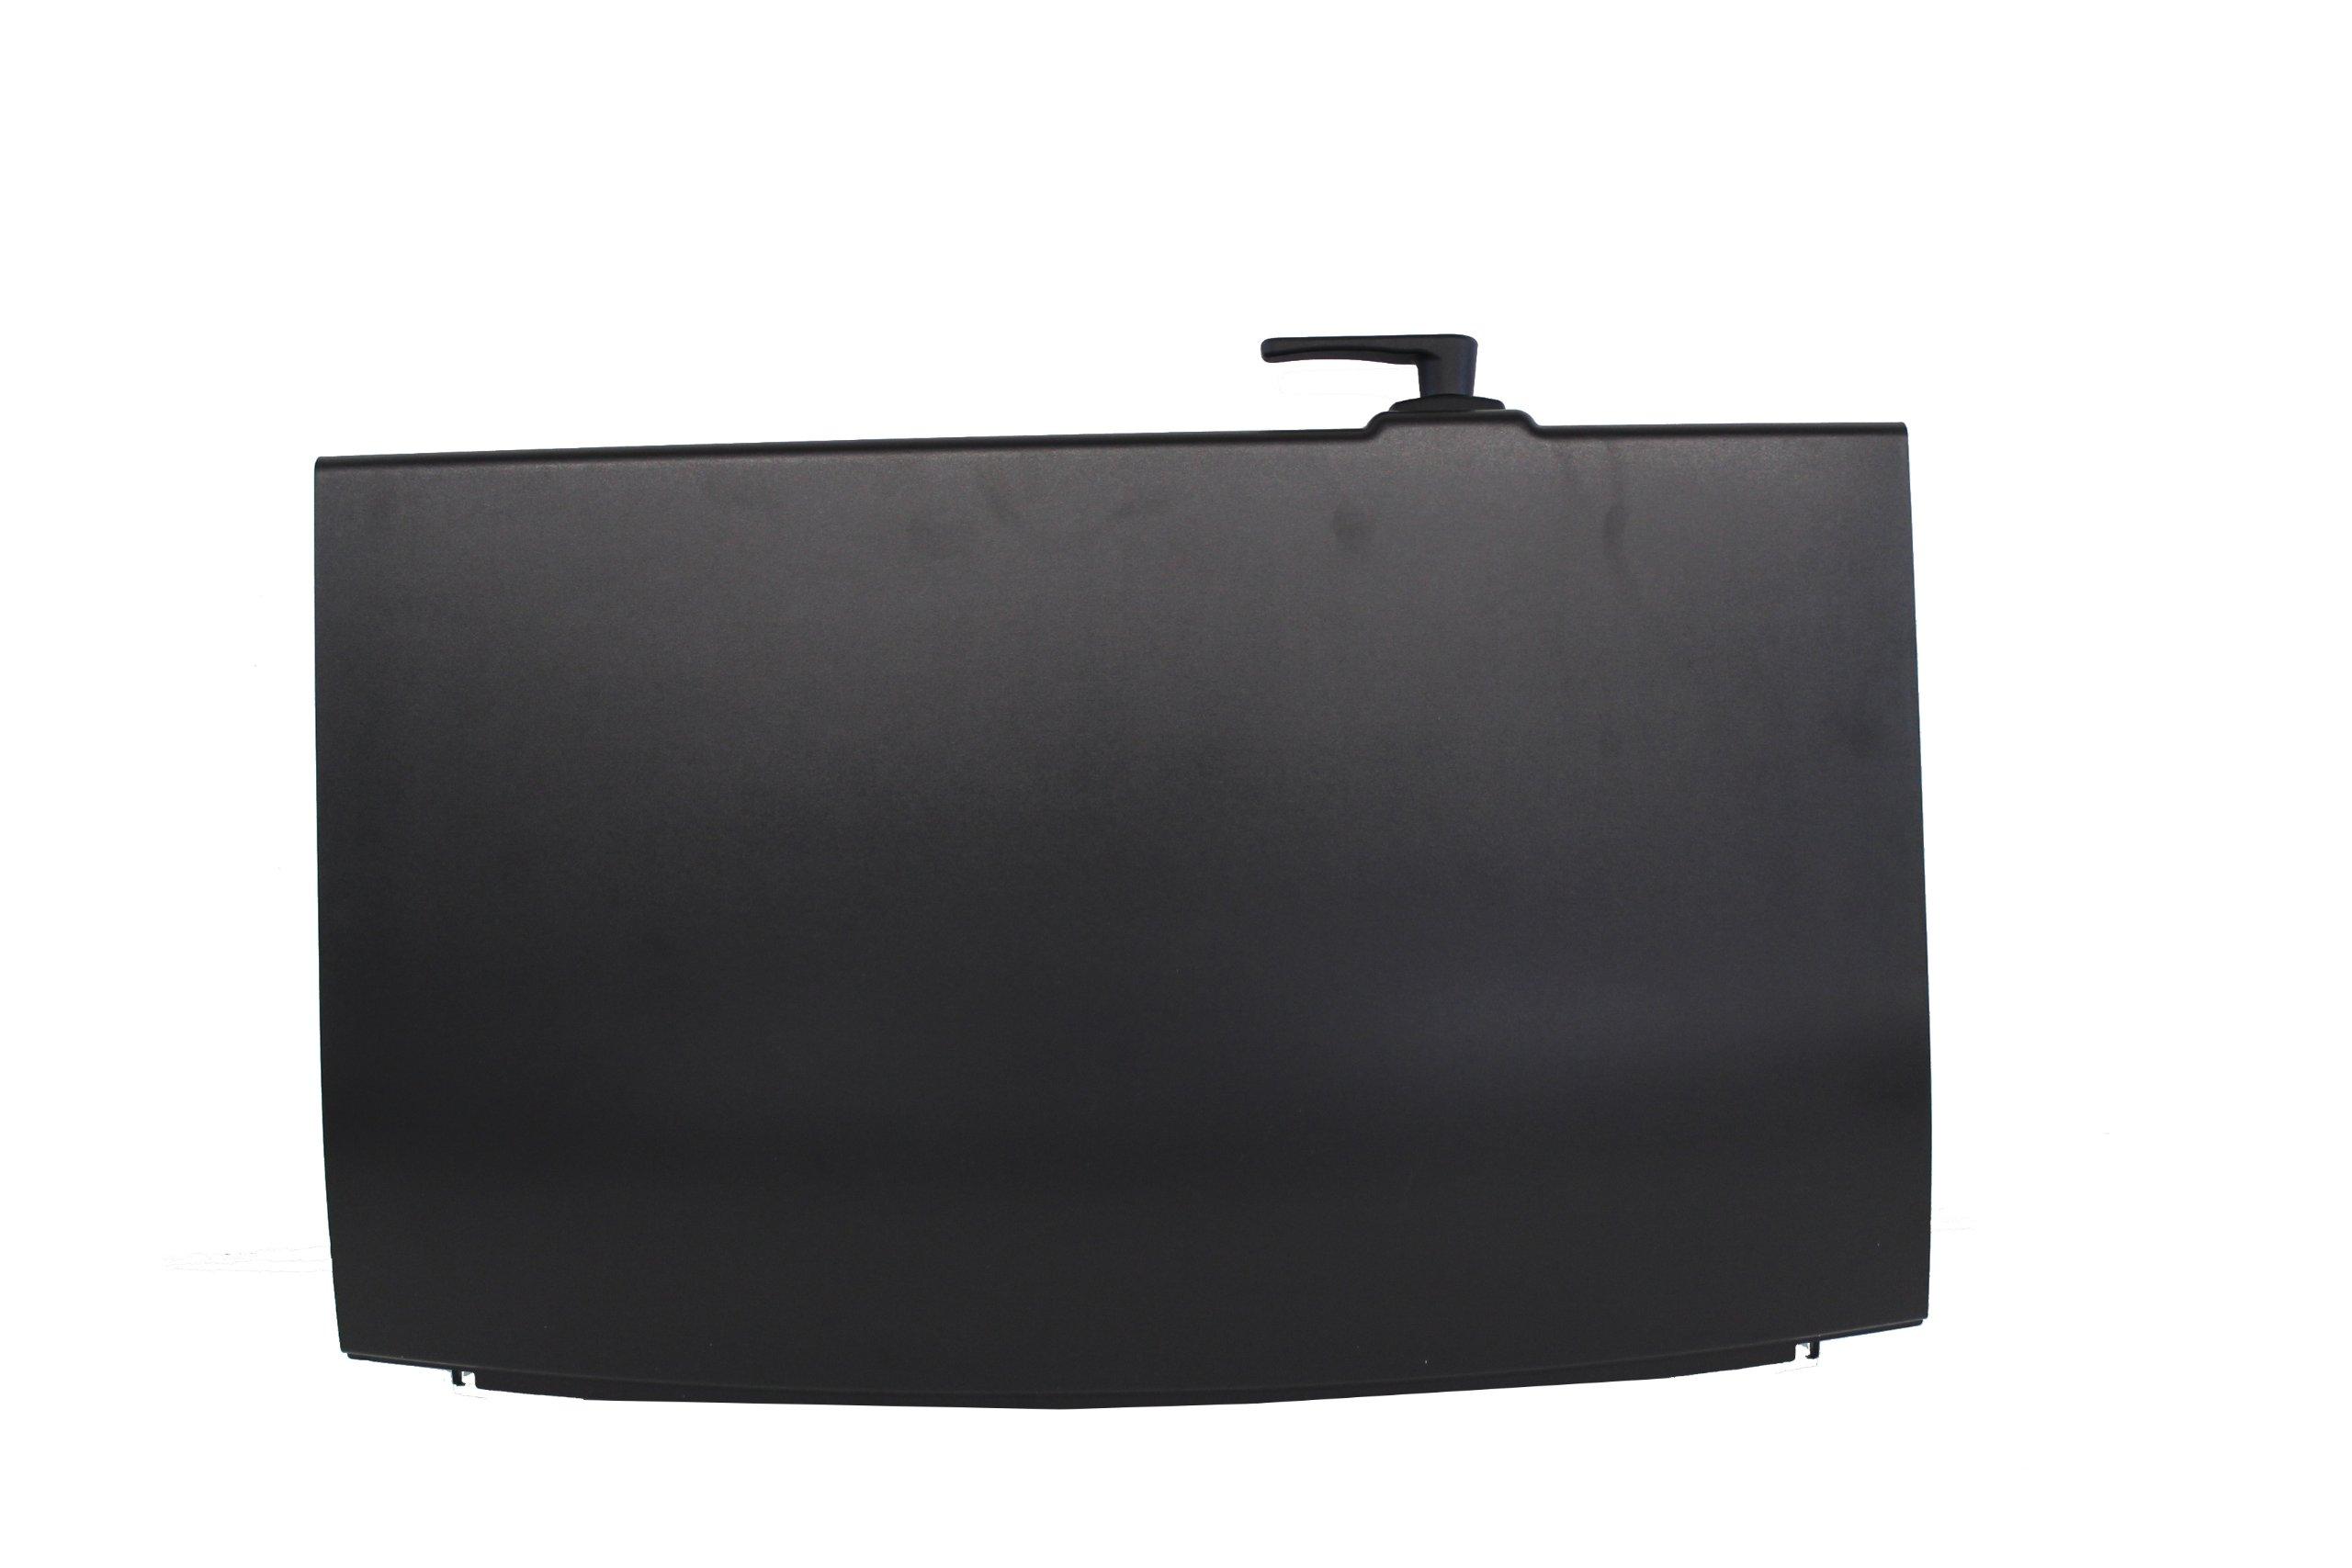 Genuine Nissan Accessories 999R1-KX500 Roof Top Gear Box